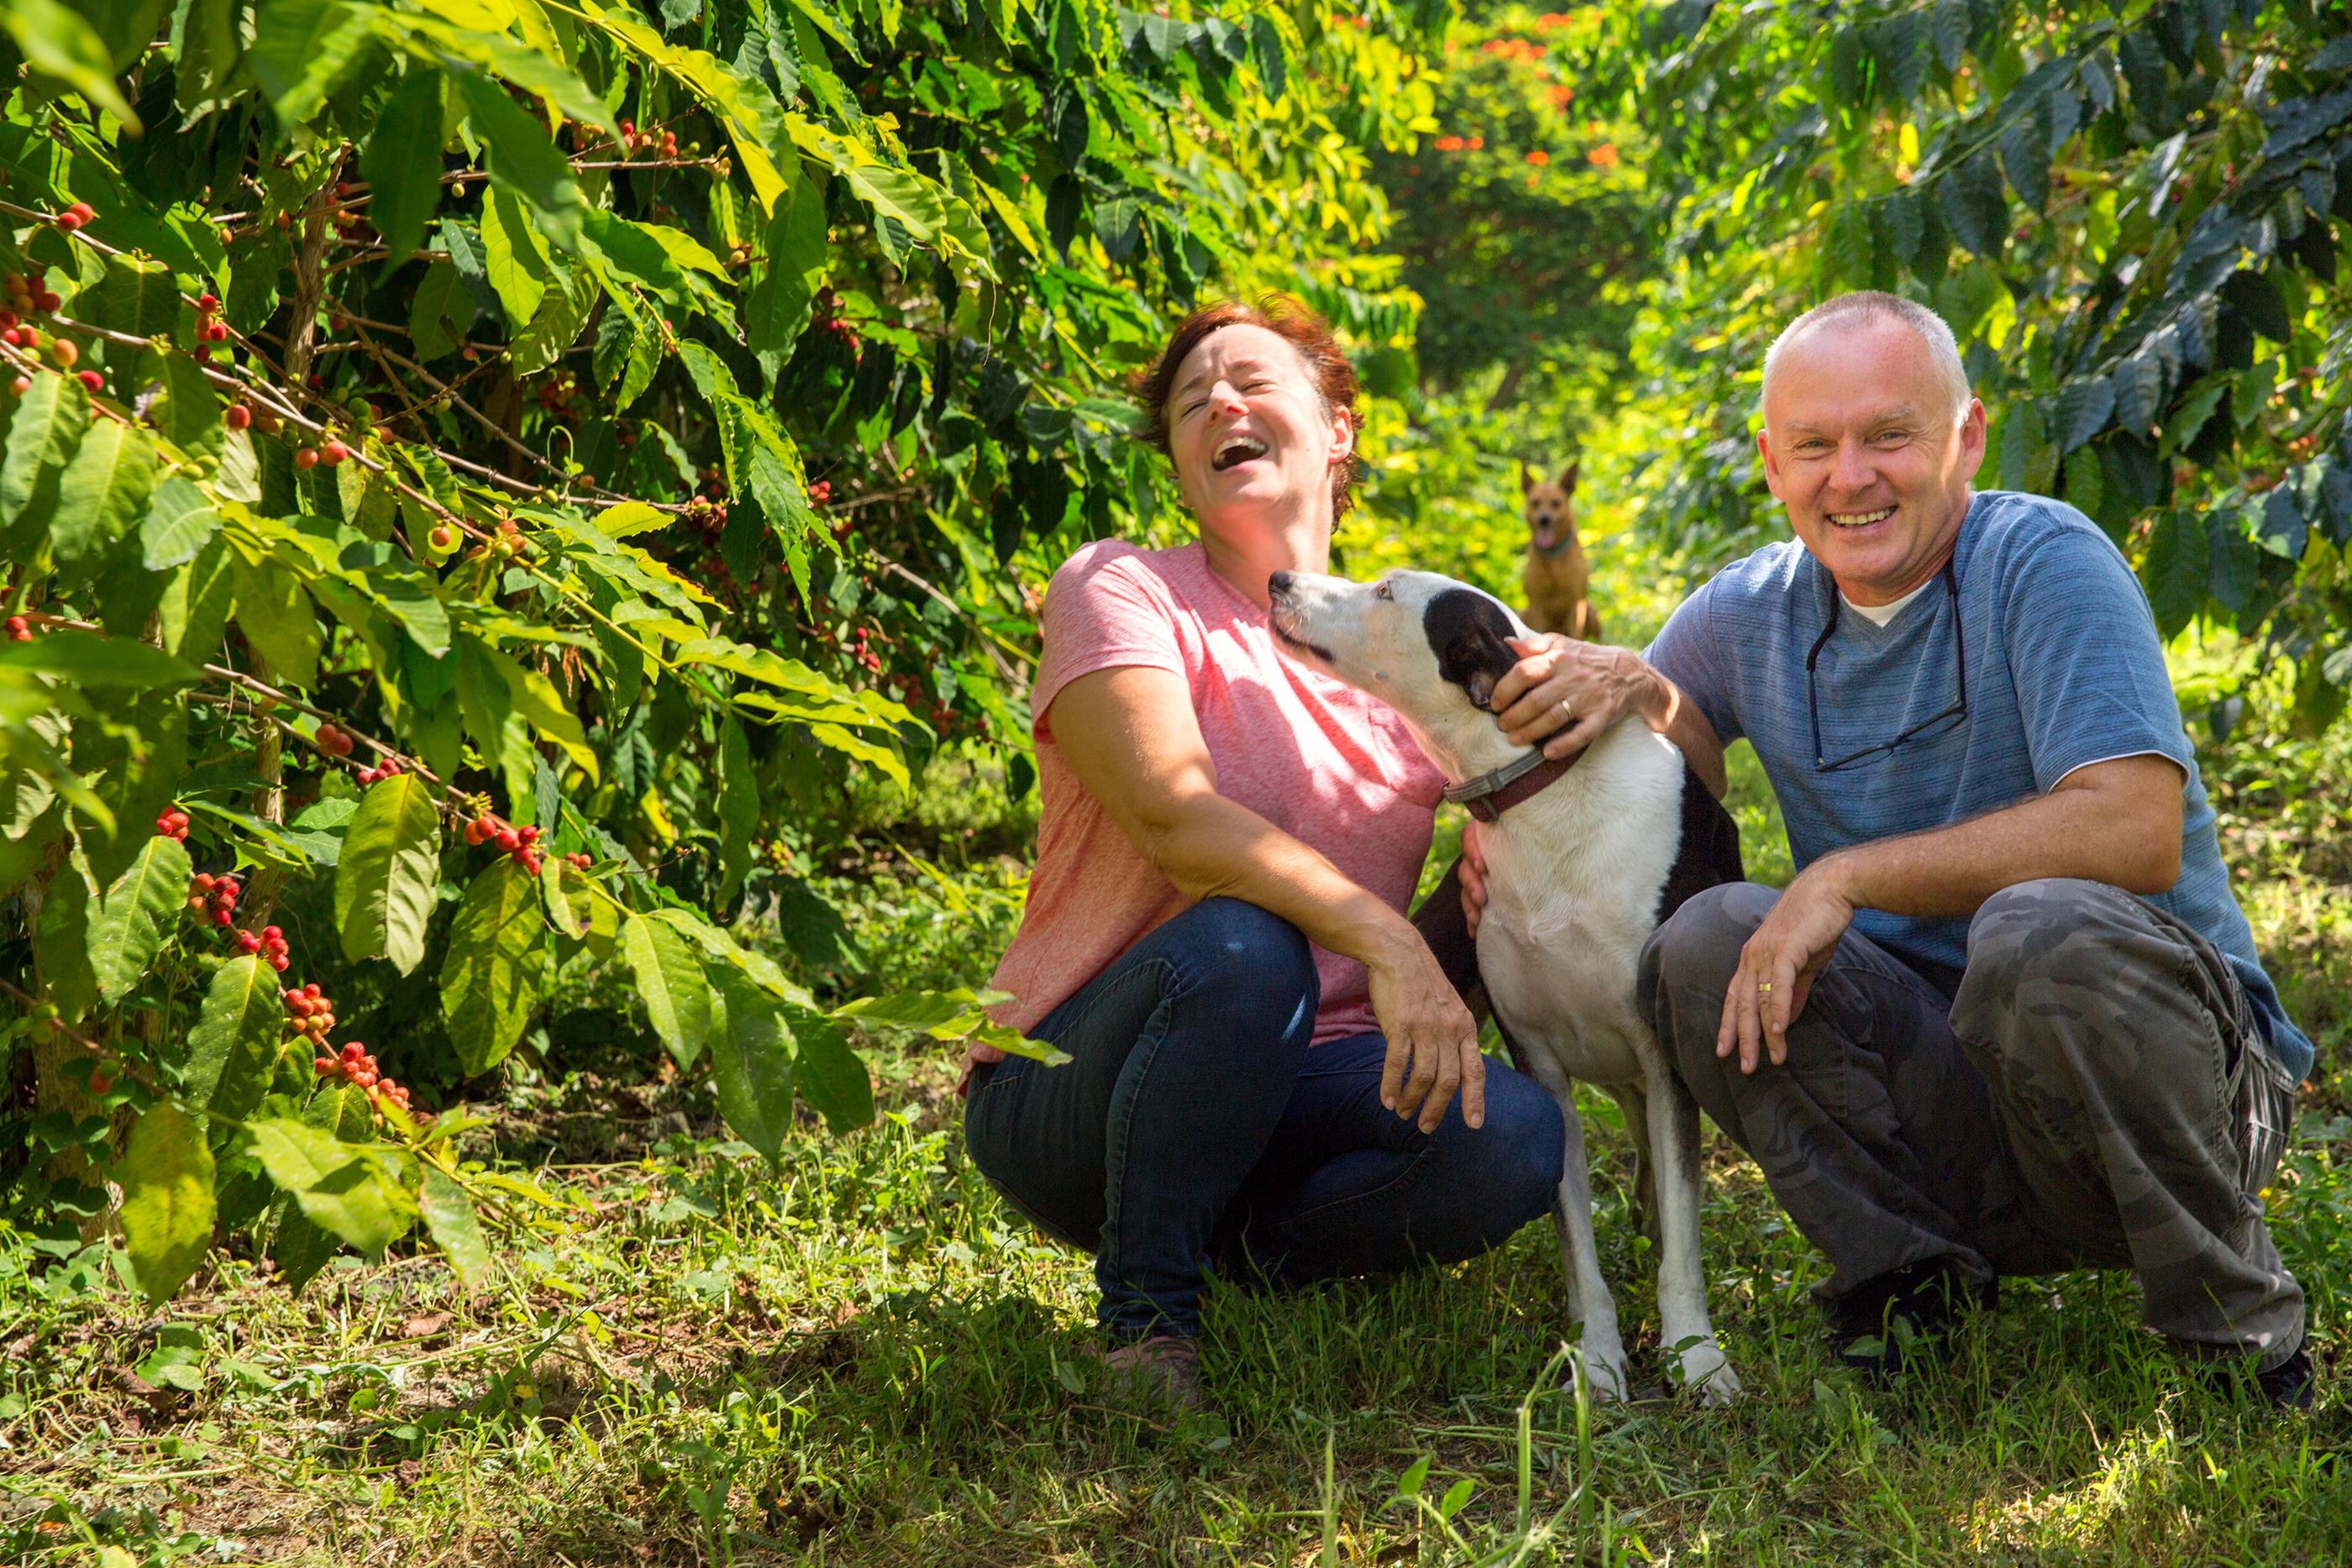 Hala Tree Coffee Farm owners Danielle and Jean Orlowski